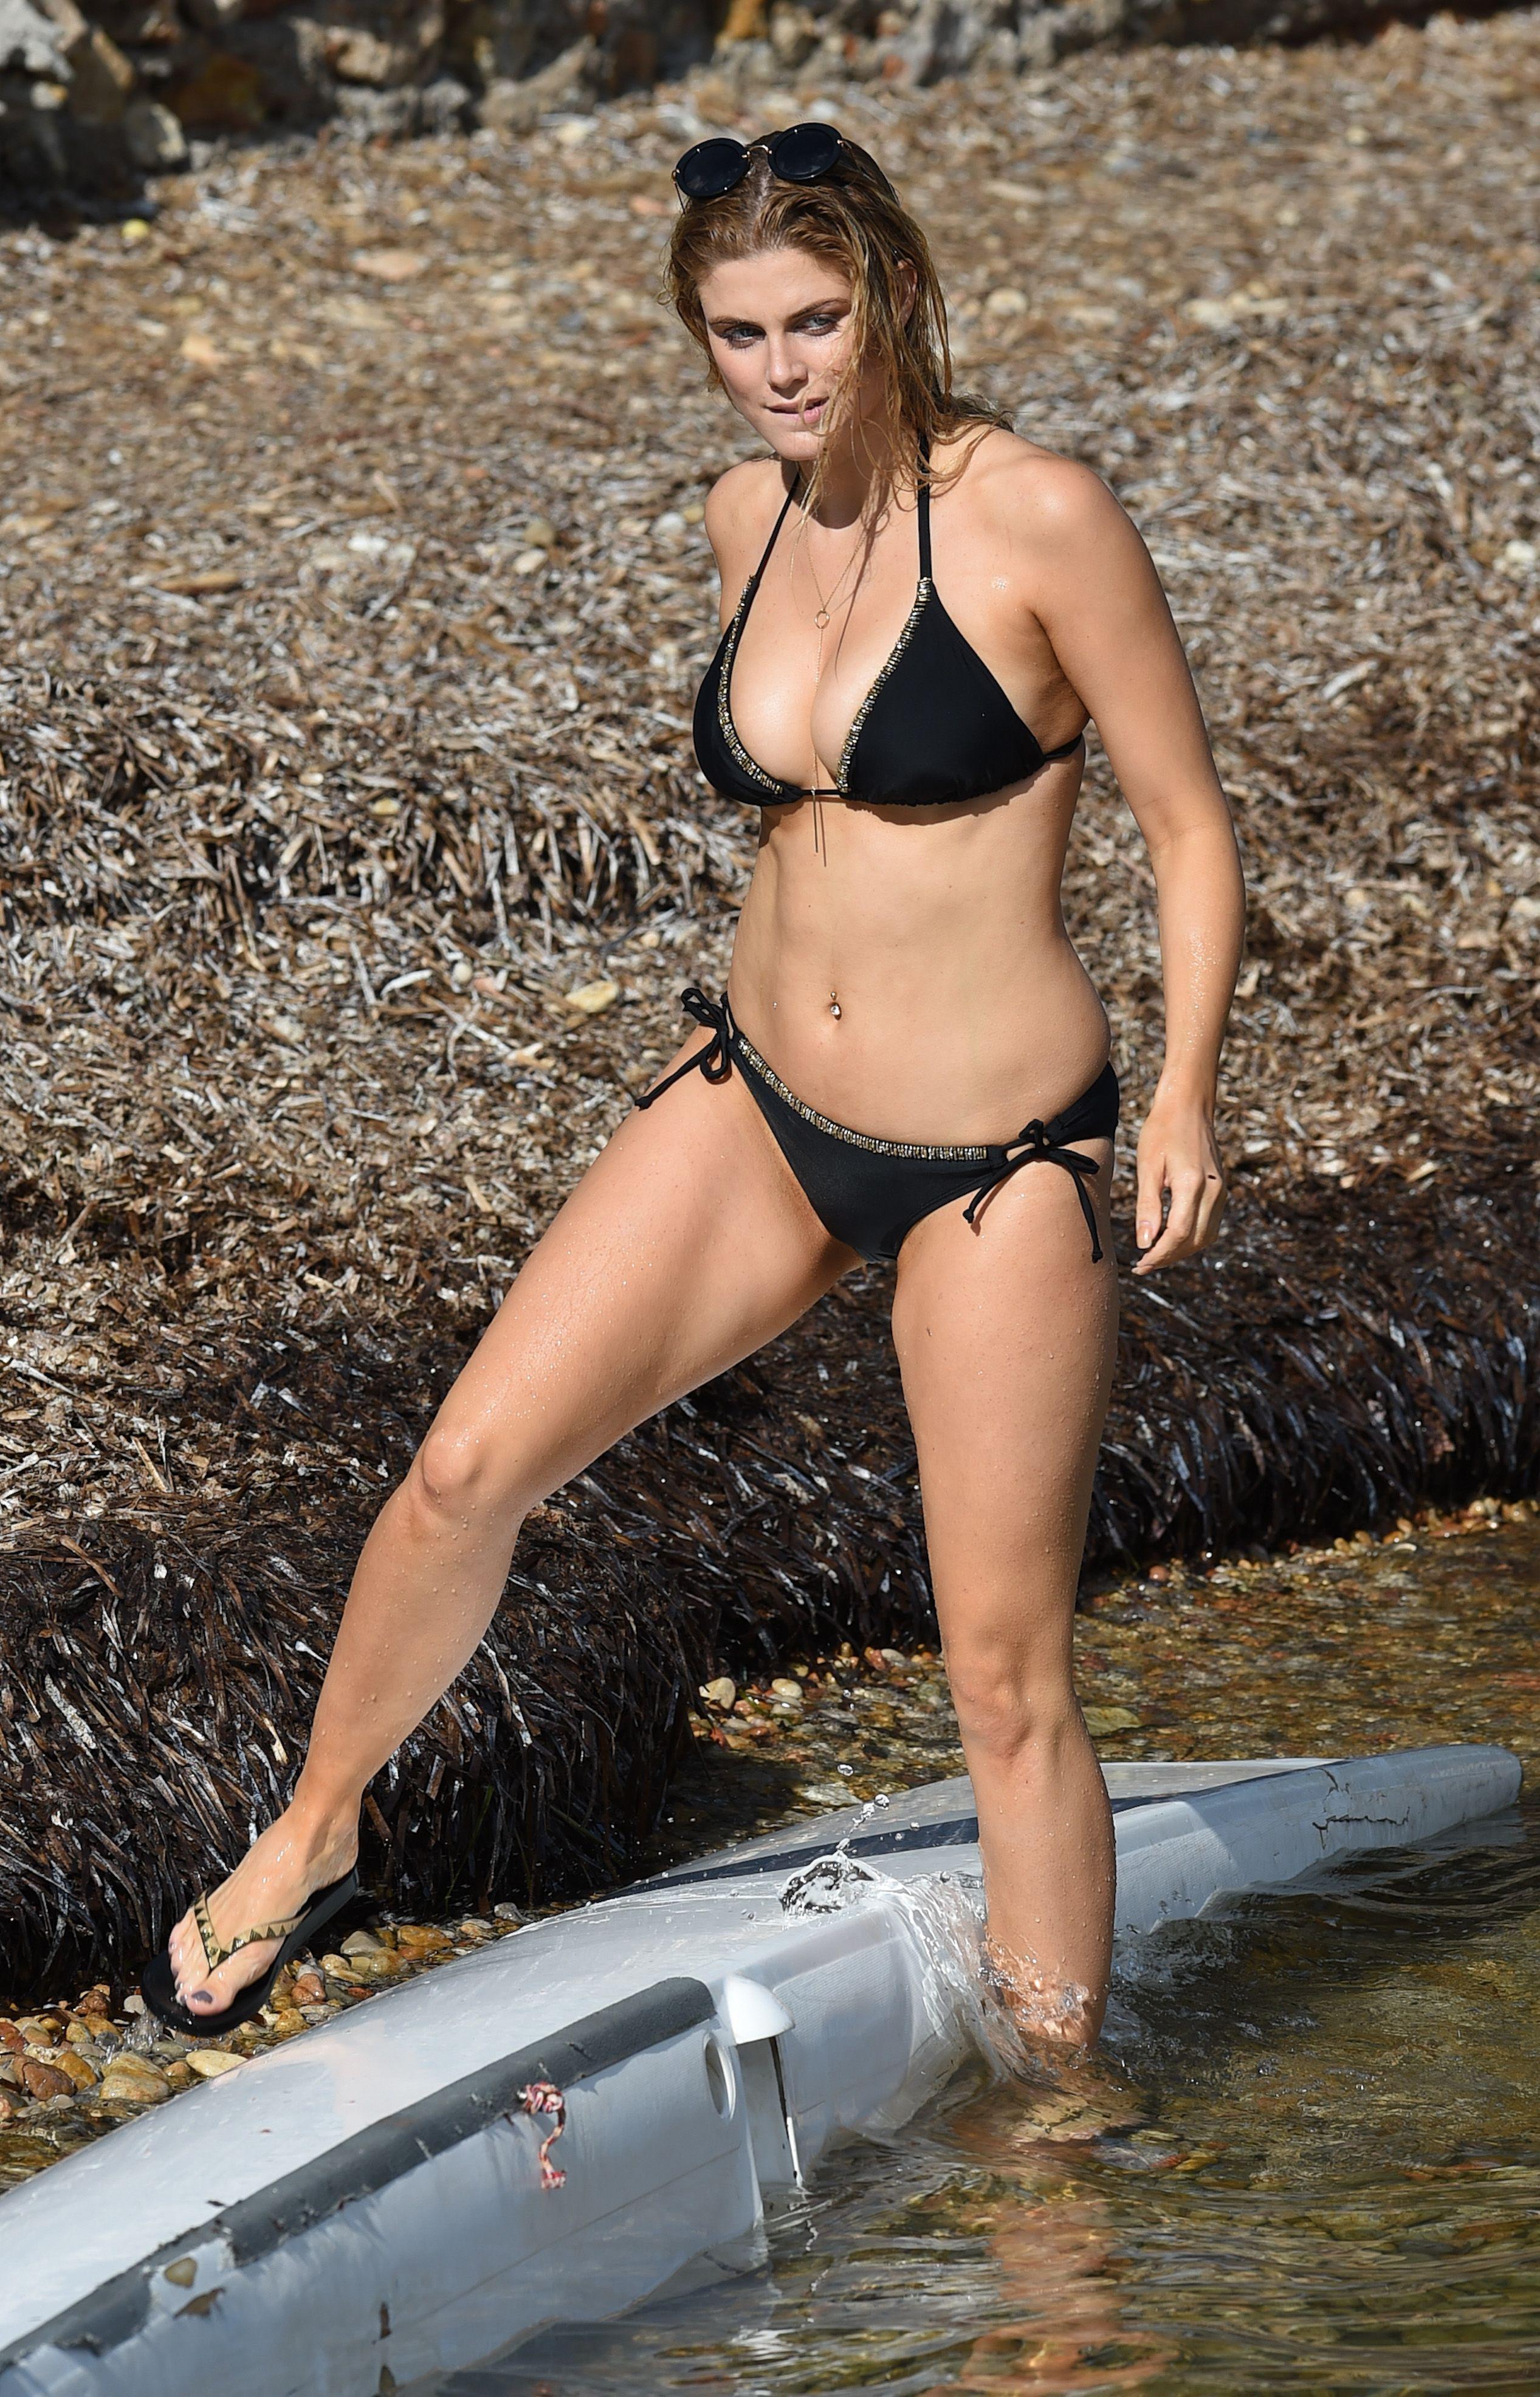 17ac77acf3 Bikini Beach, Bikini Girls, Thong Bikini, Ashley Williams, Chelsea Girls,  Celebs